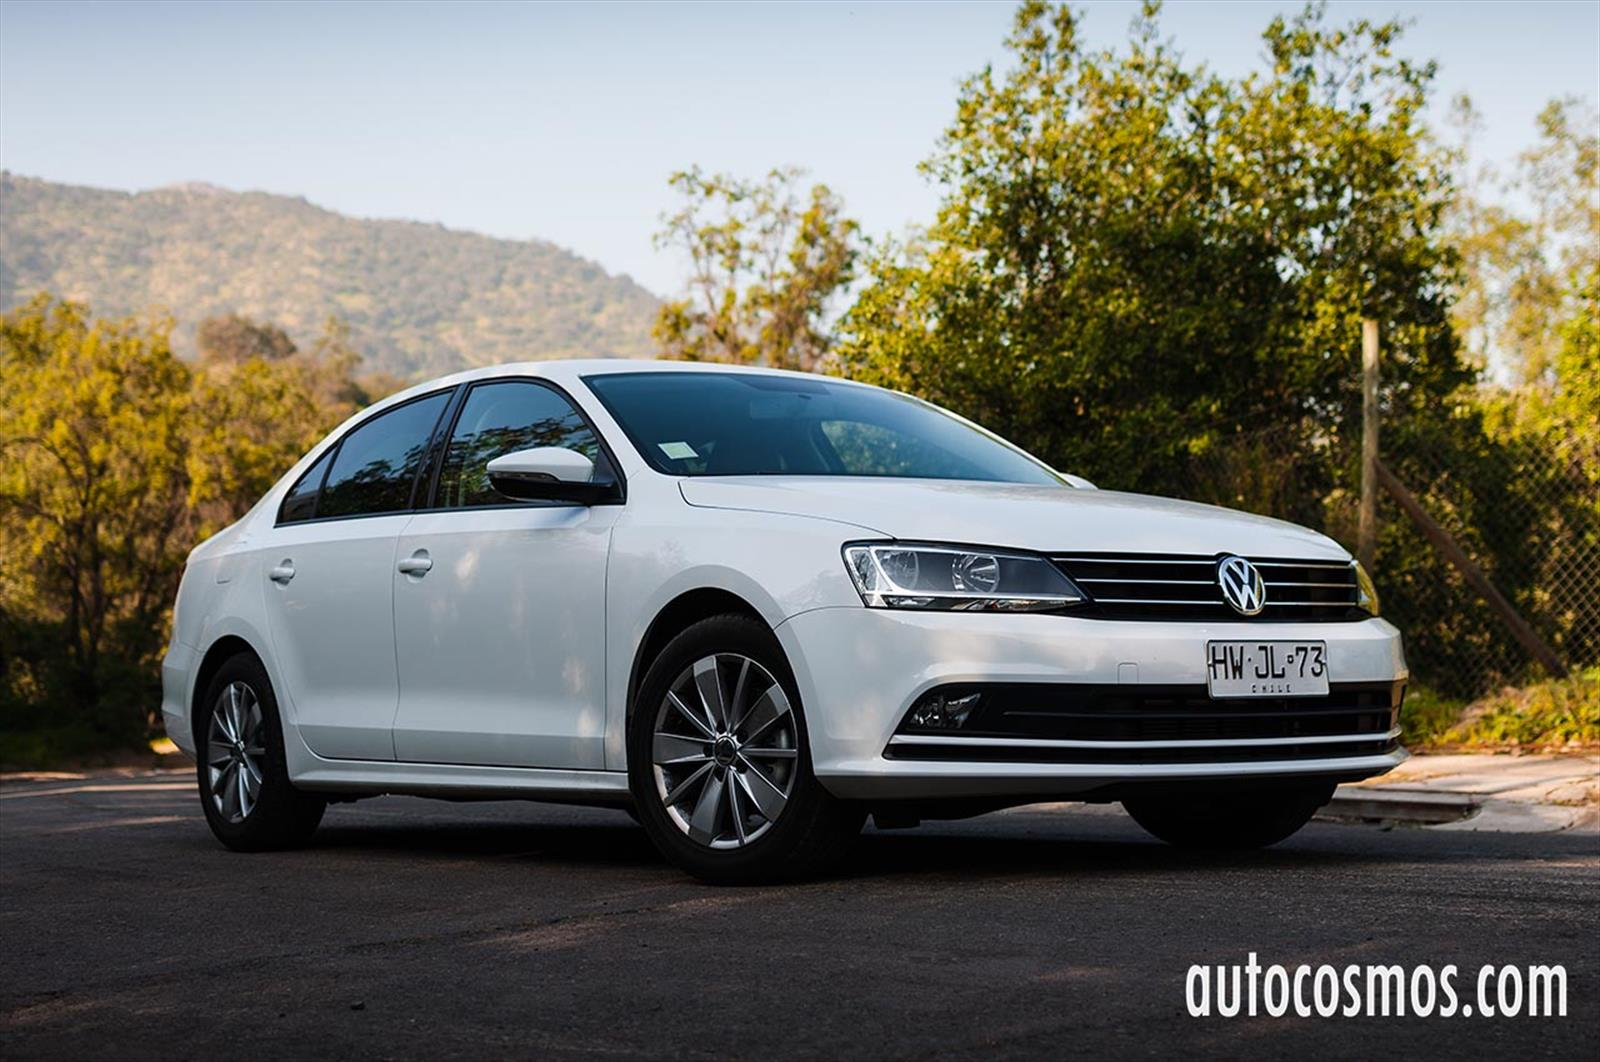 Test Drive Volkswagen Bora 2017 Autocosmos Com